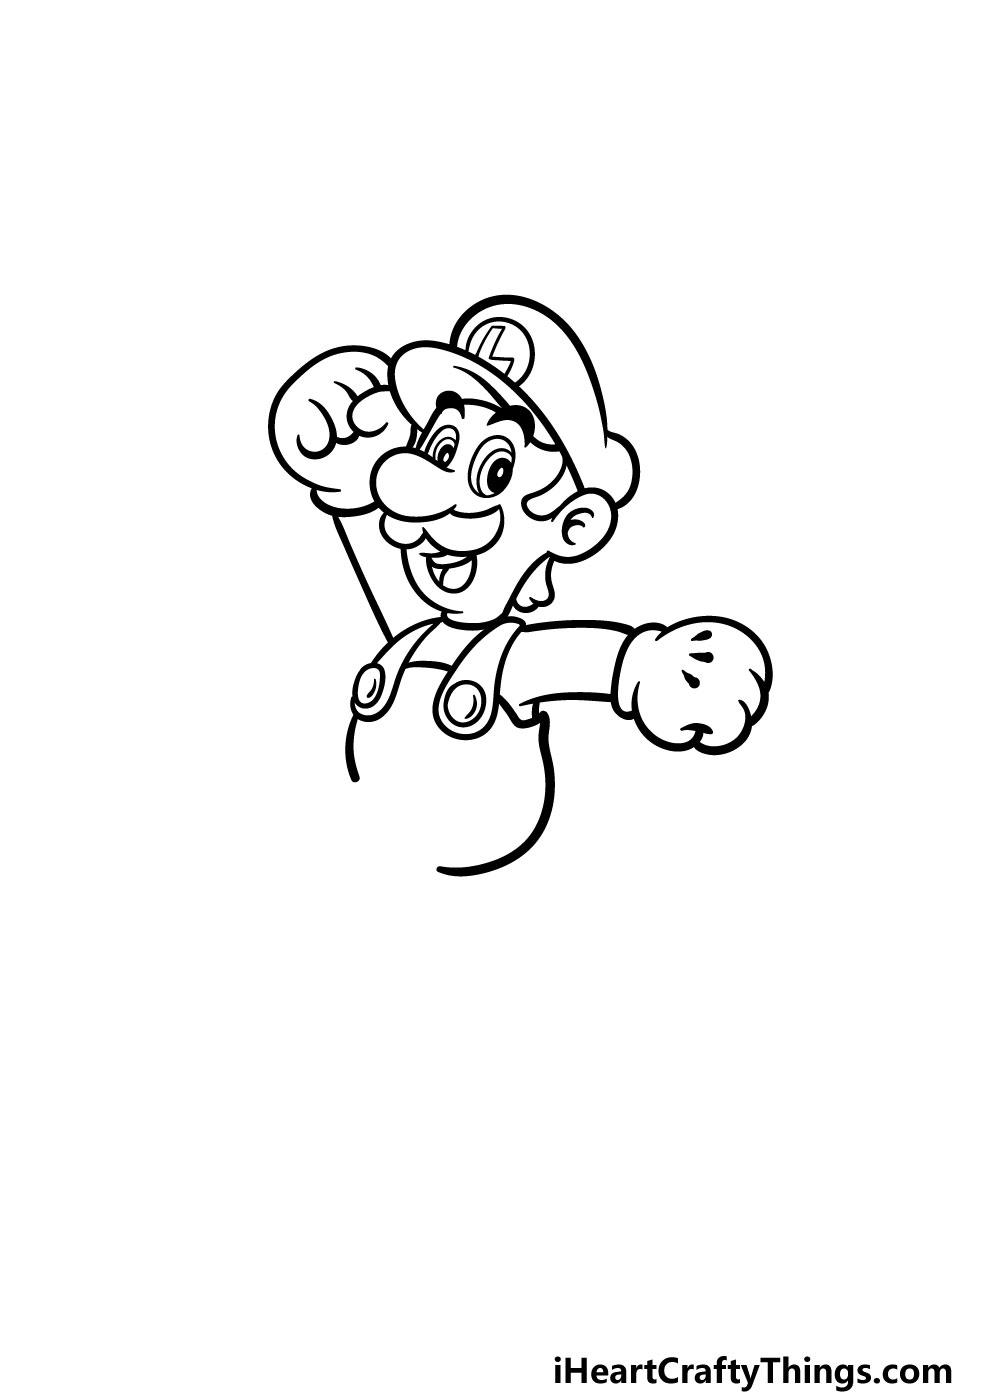 drawing luigi step 4